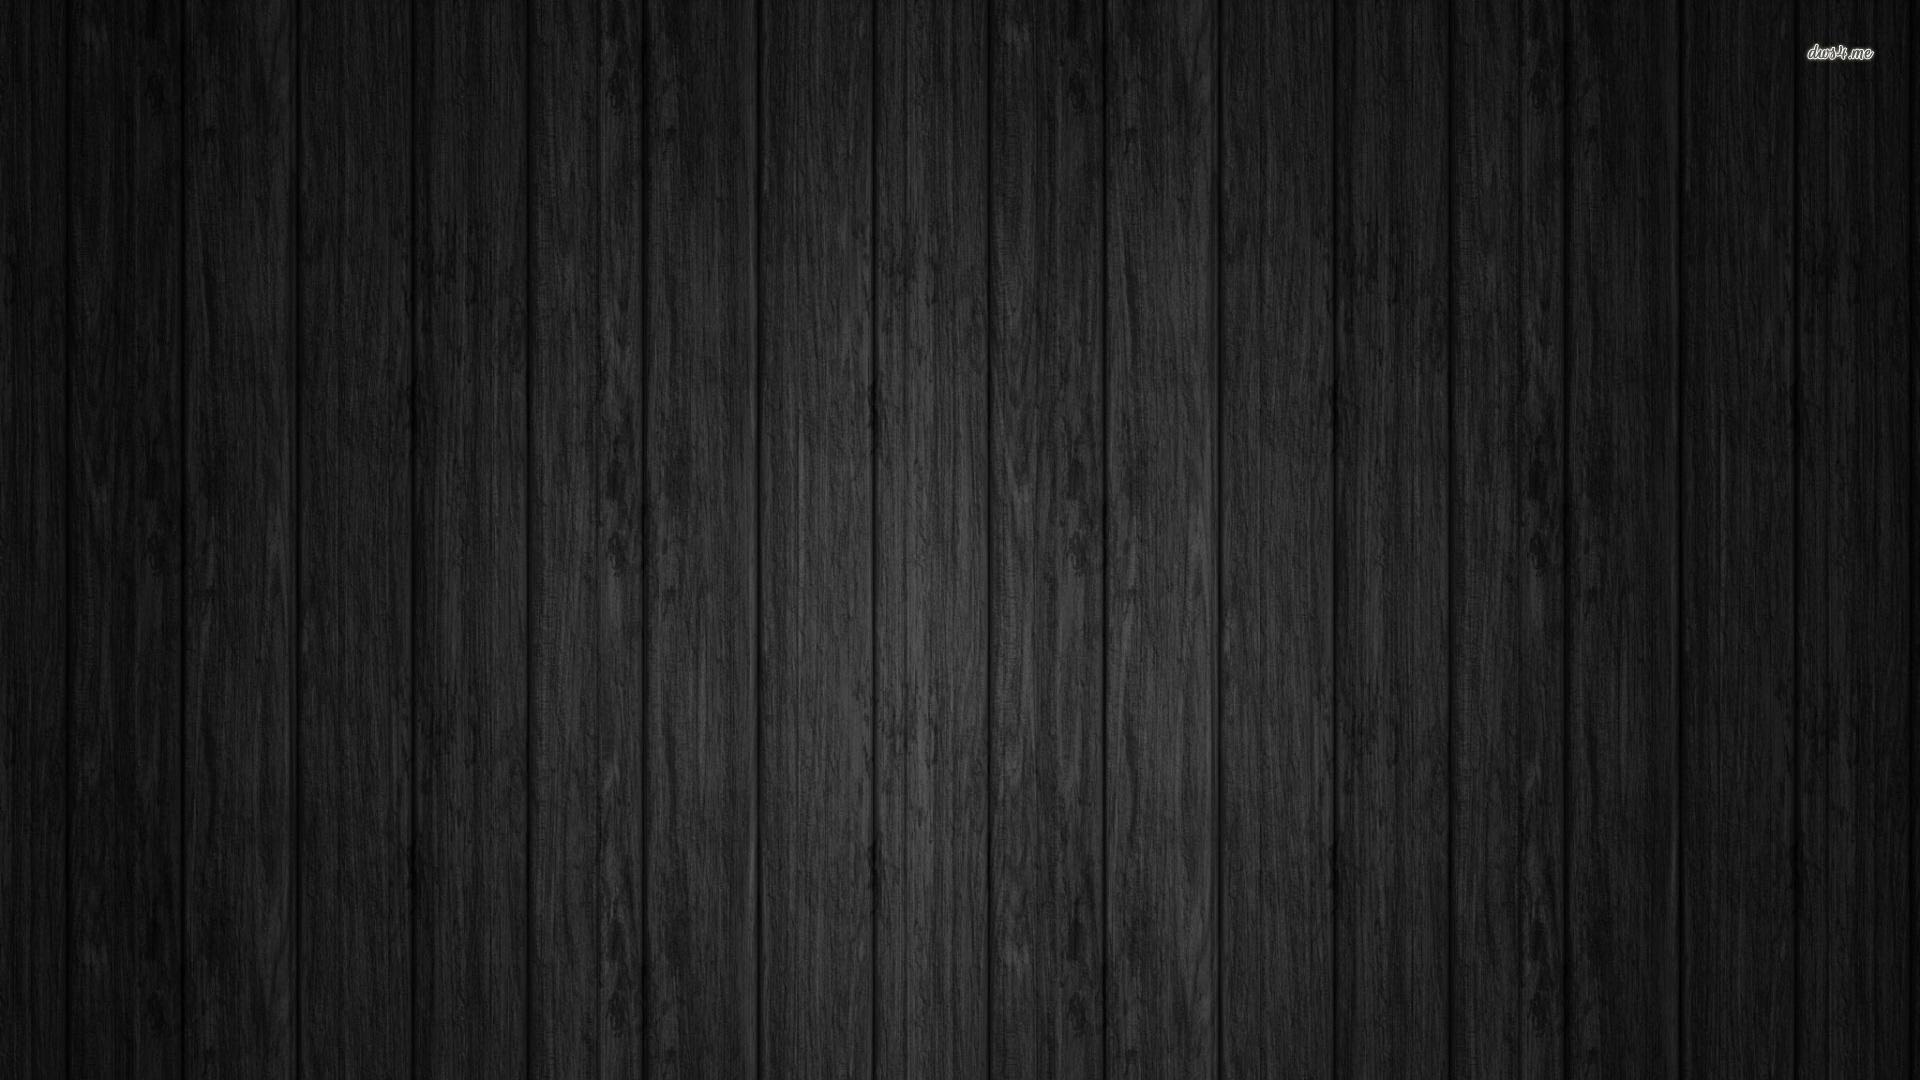 47 Black Wallpaper Texture On Wallpapersafari